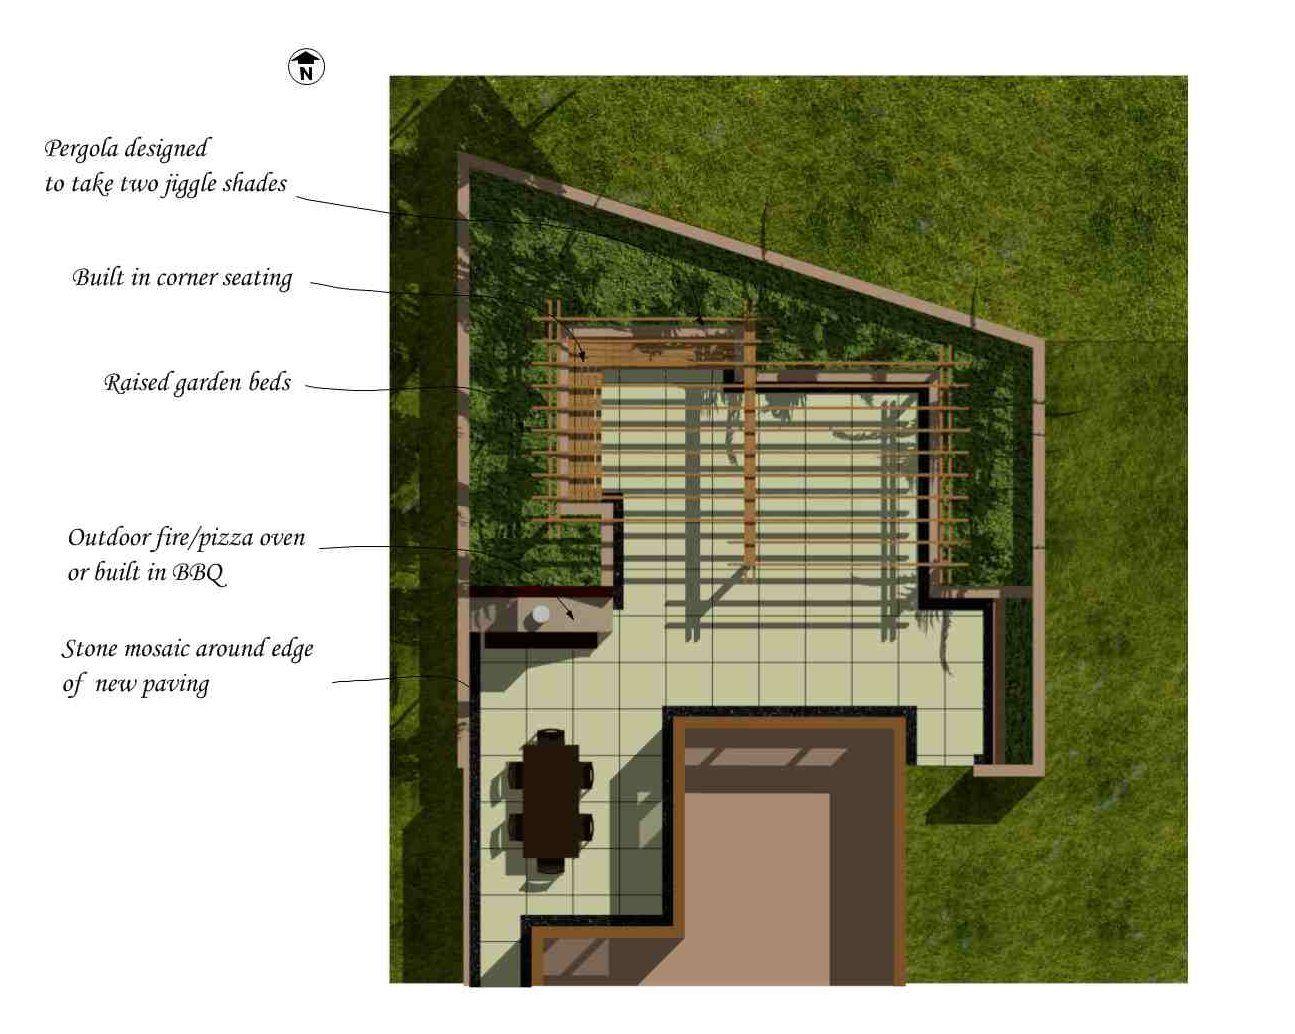 Walled Sunken Courtyard In Plan View Designed By Fusion Landscape Design Www Fusionlandscapedesign Co Nz Landscape Design Built In Bbq Pergola Designs